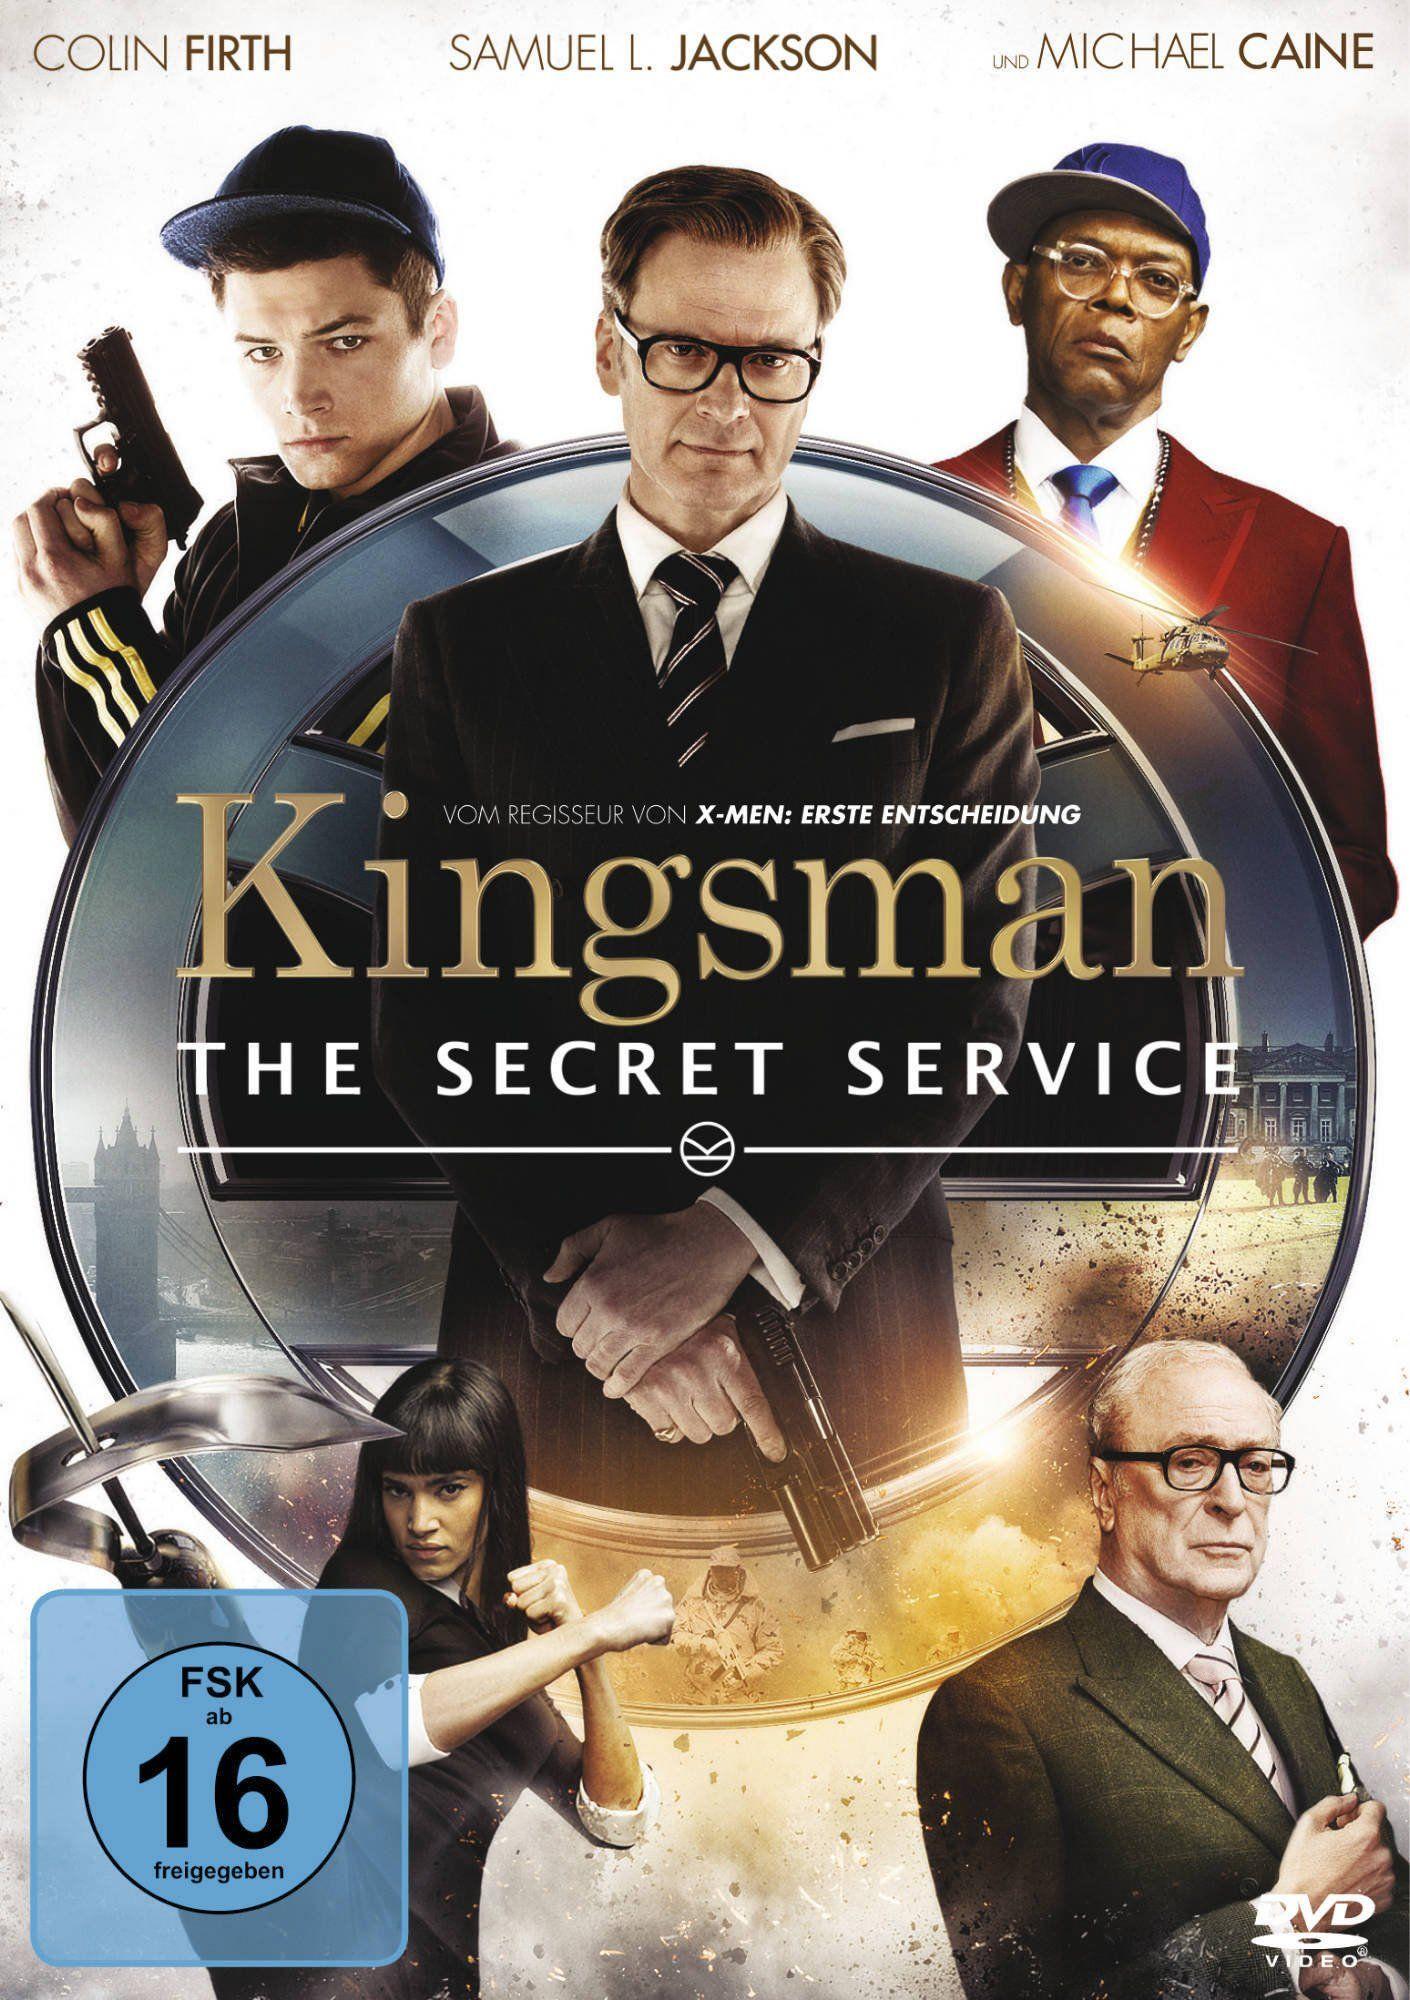 Kingsman The Secret Service Geheimdienst Filme Kingsman